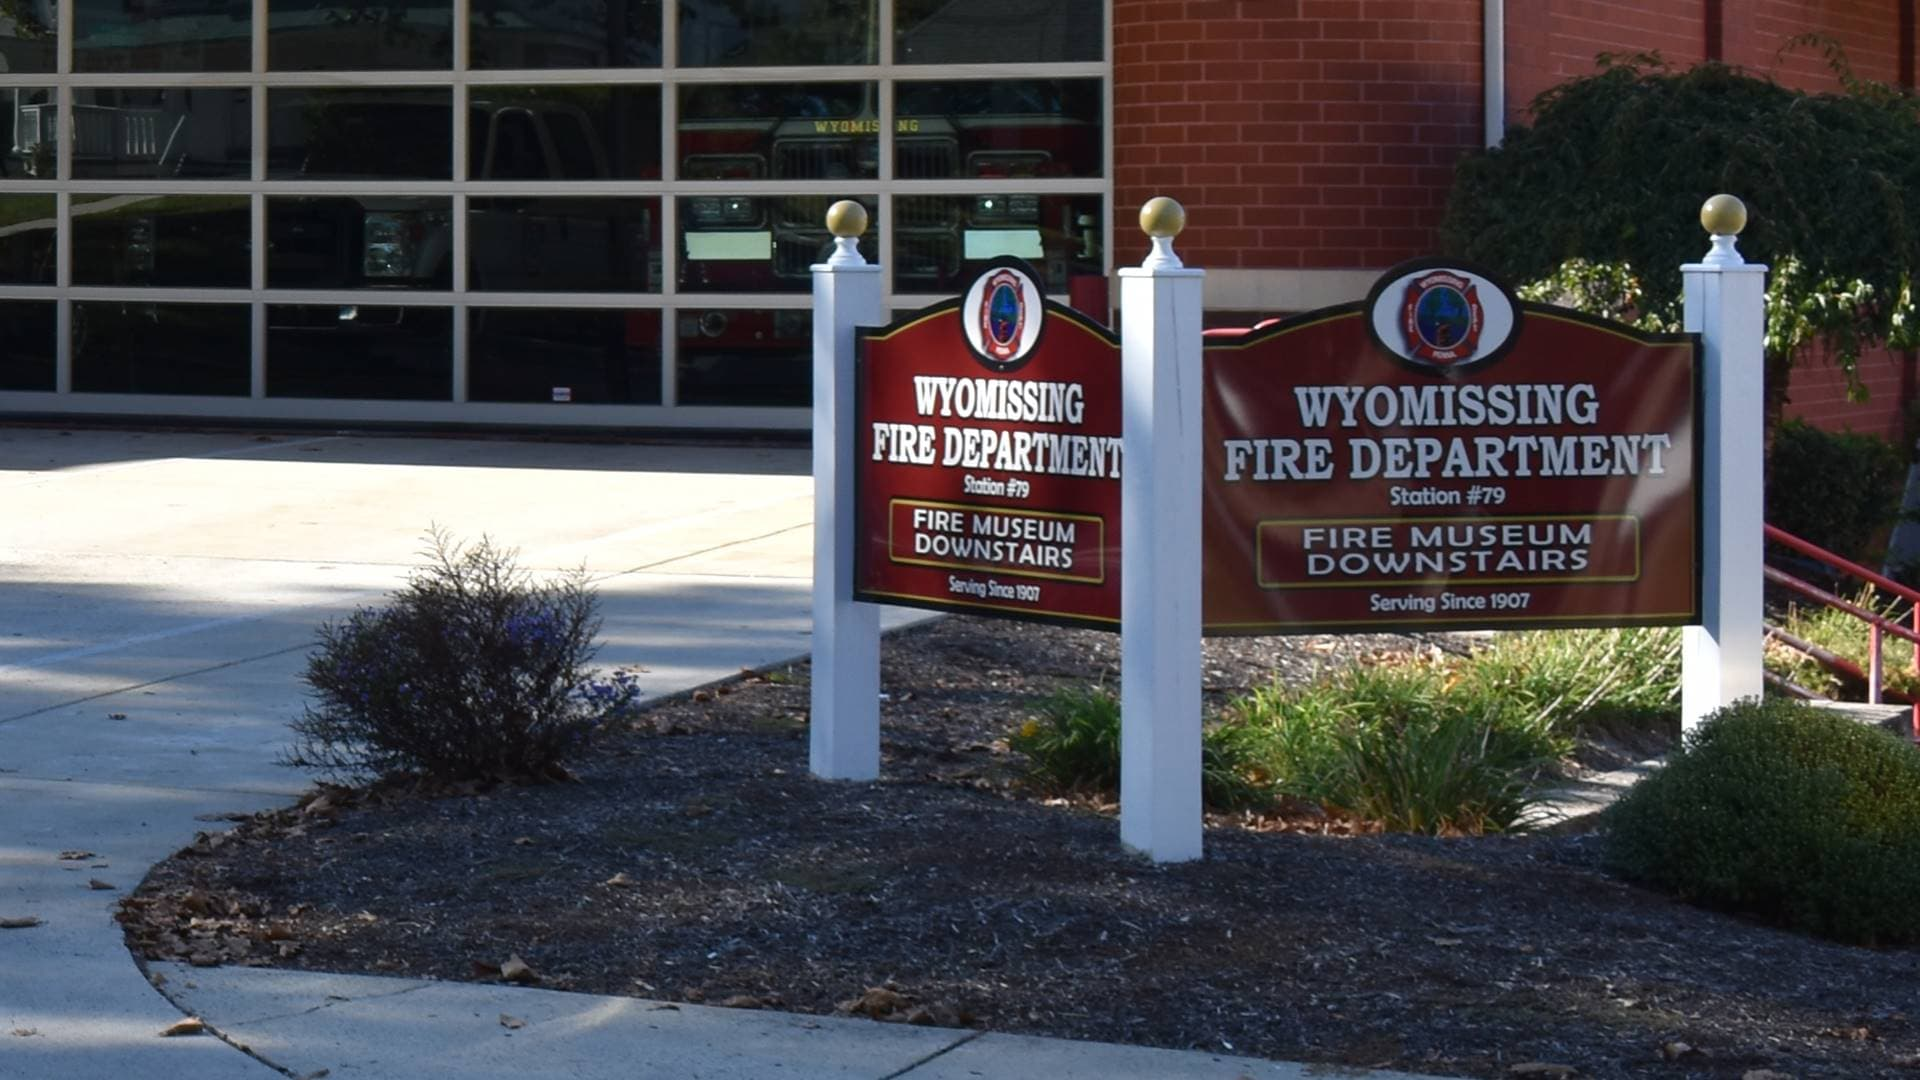 Wyomissing Fire Company